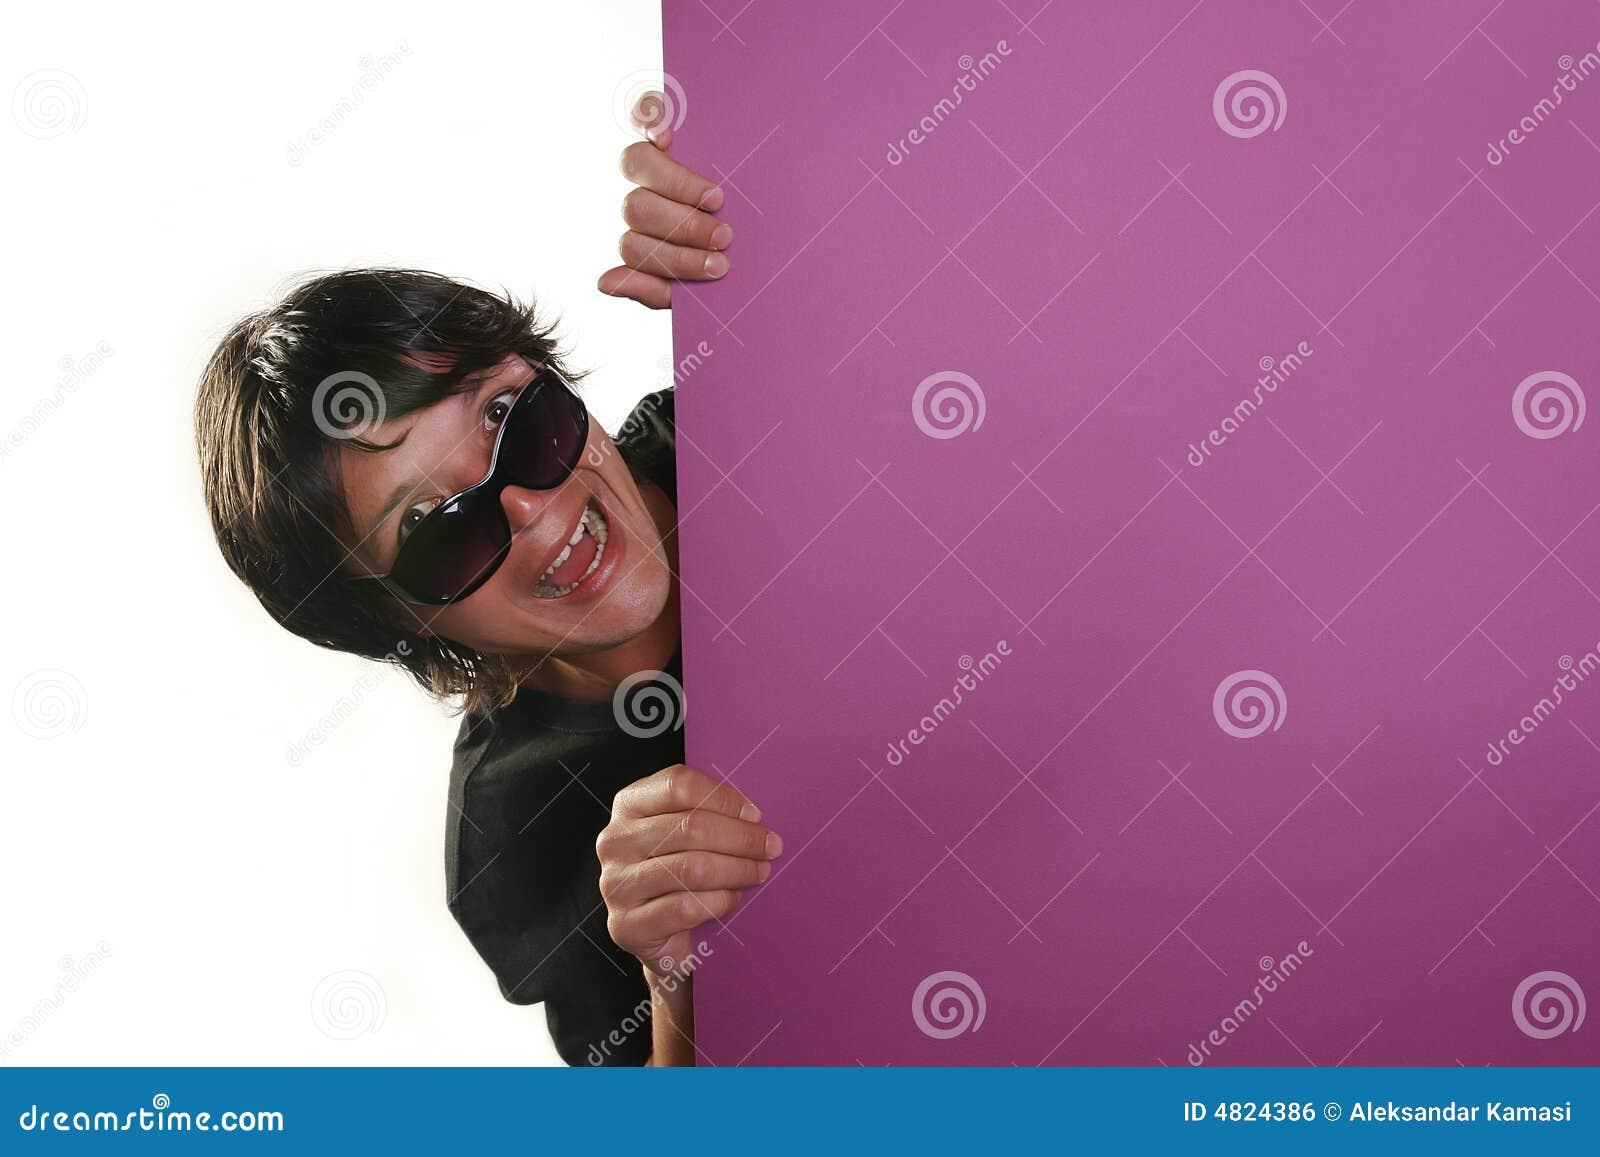 Mens die een aanplakbord houdt